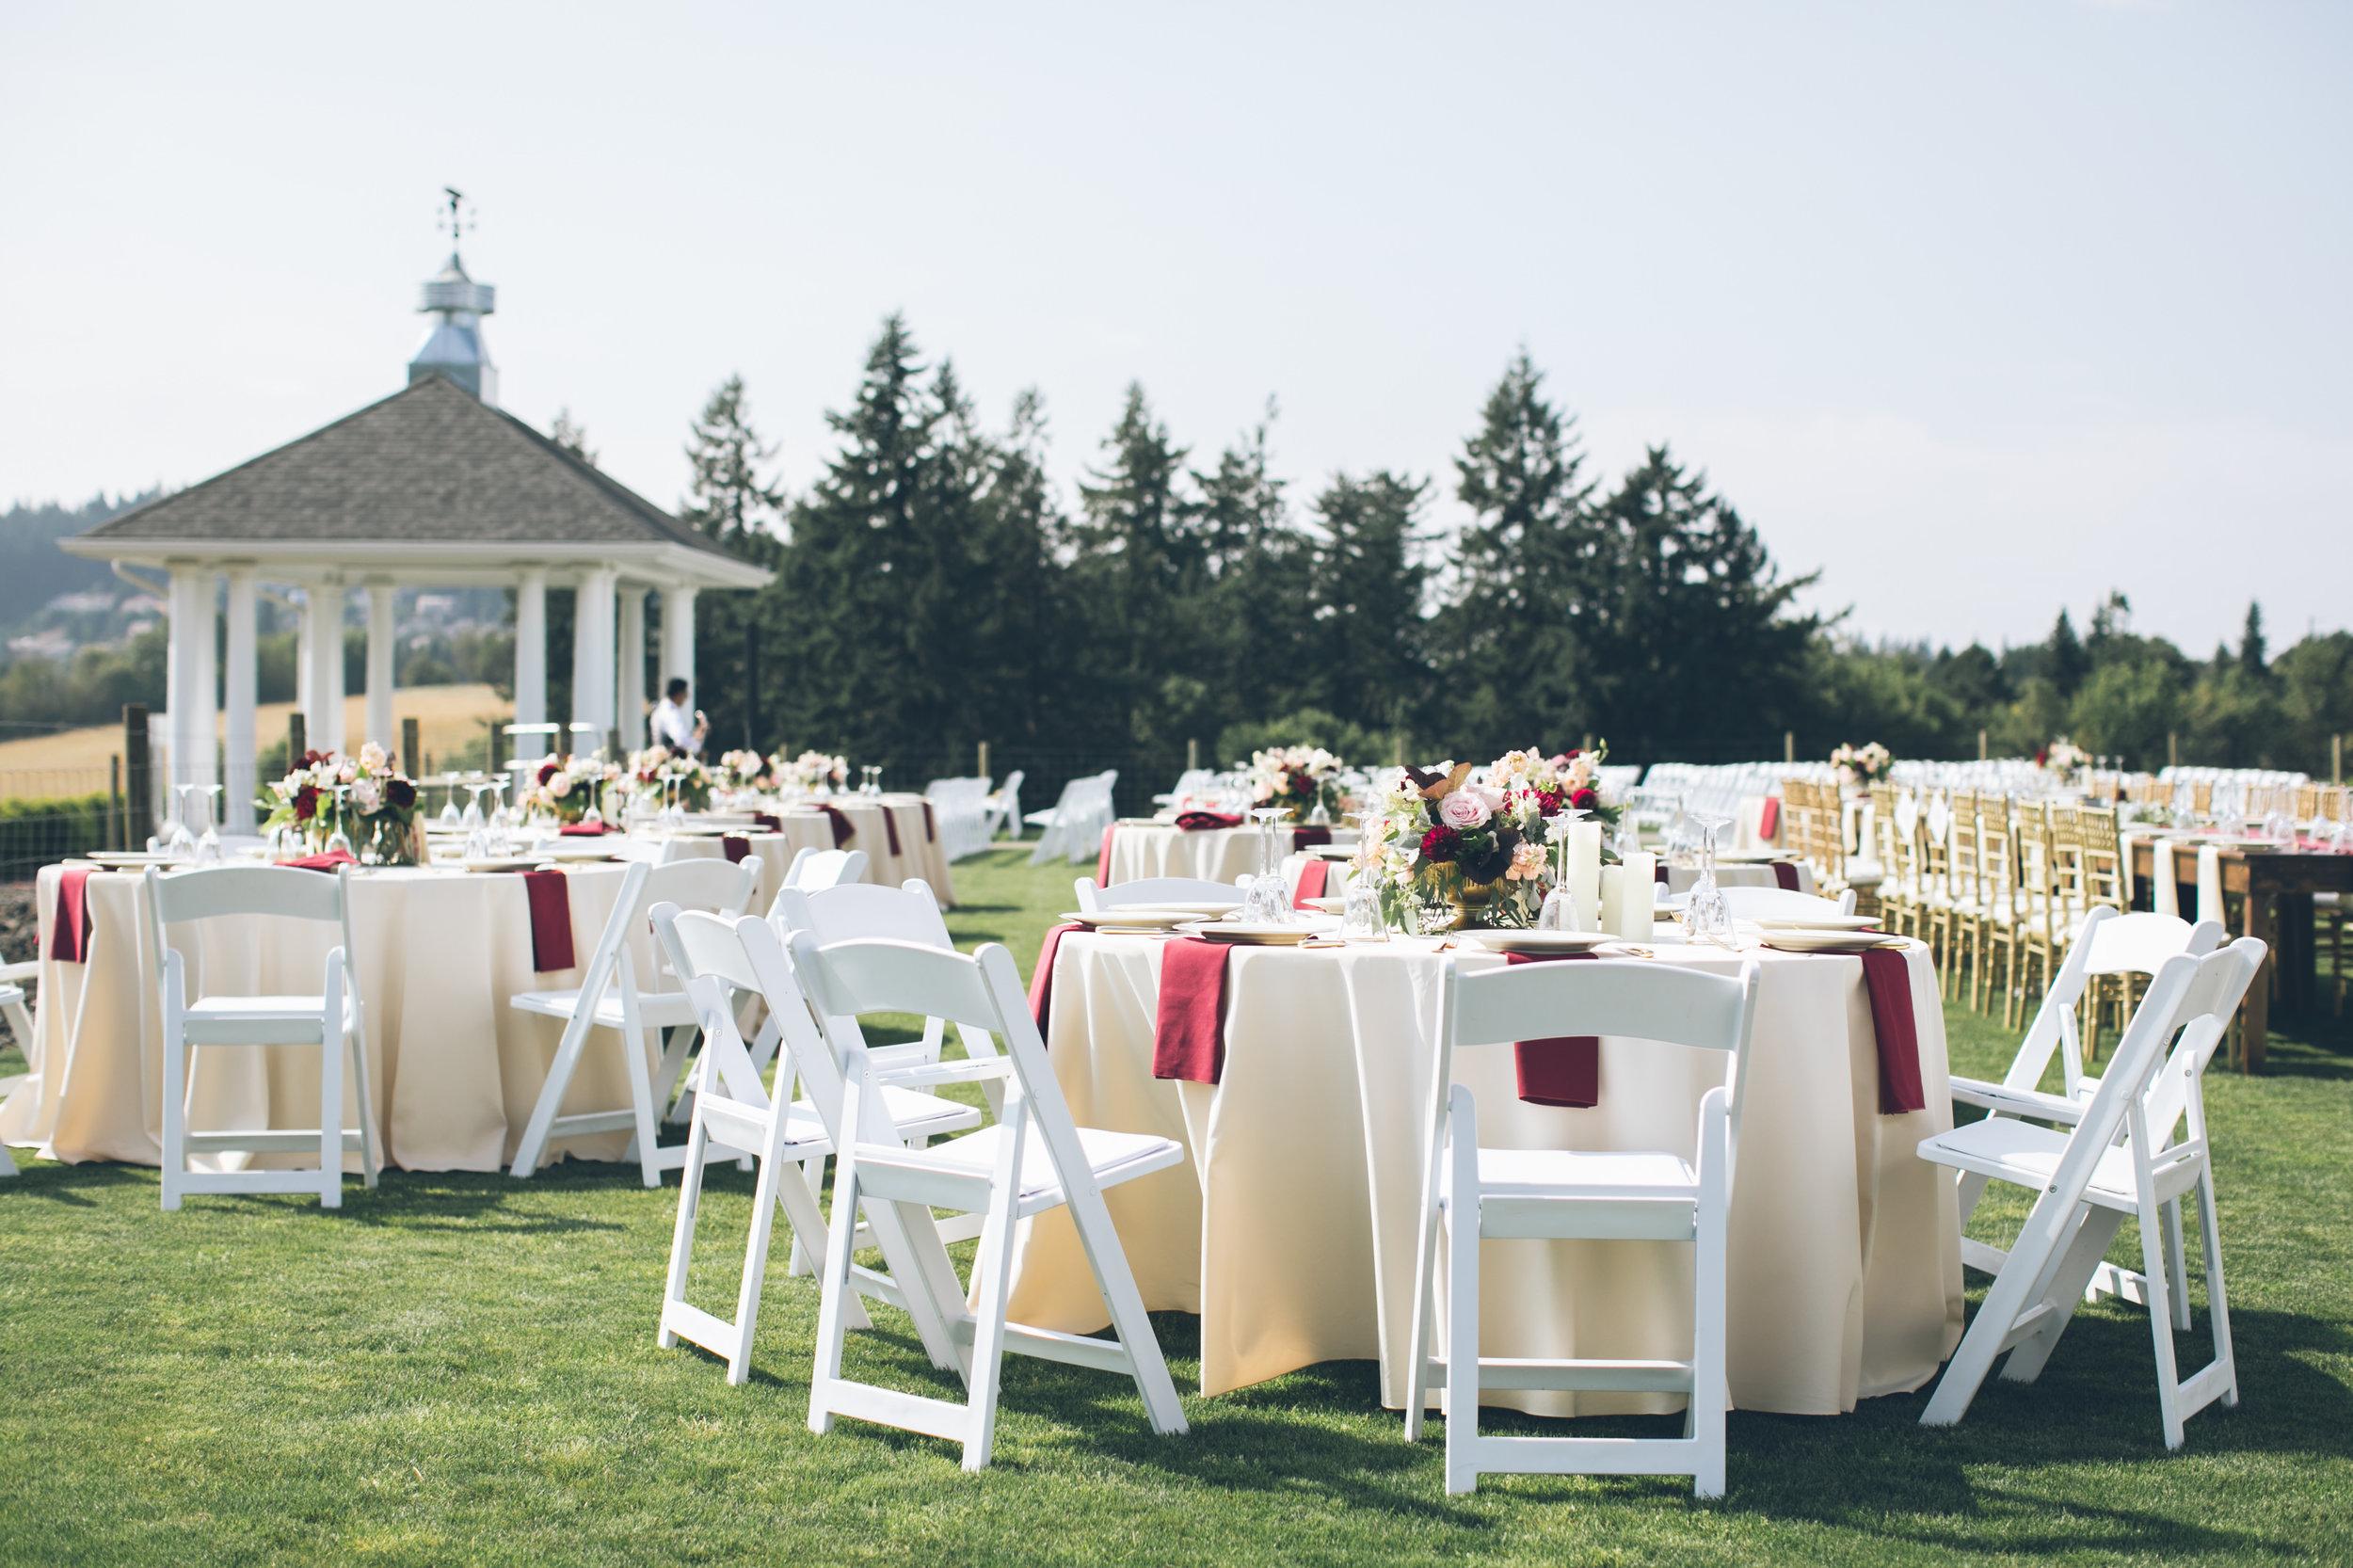 oswego-hills-winery-wedding-aniko-21.jpg